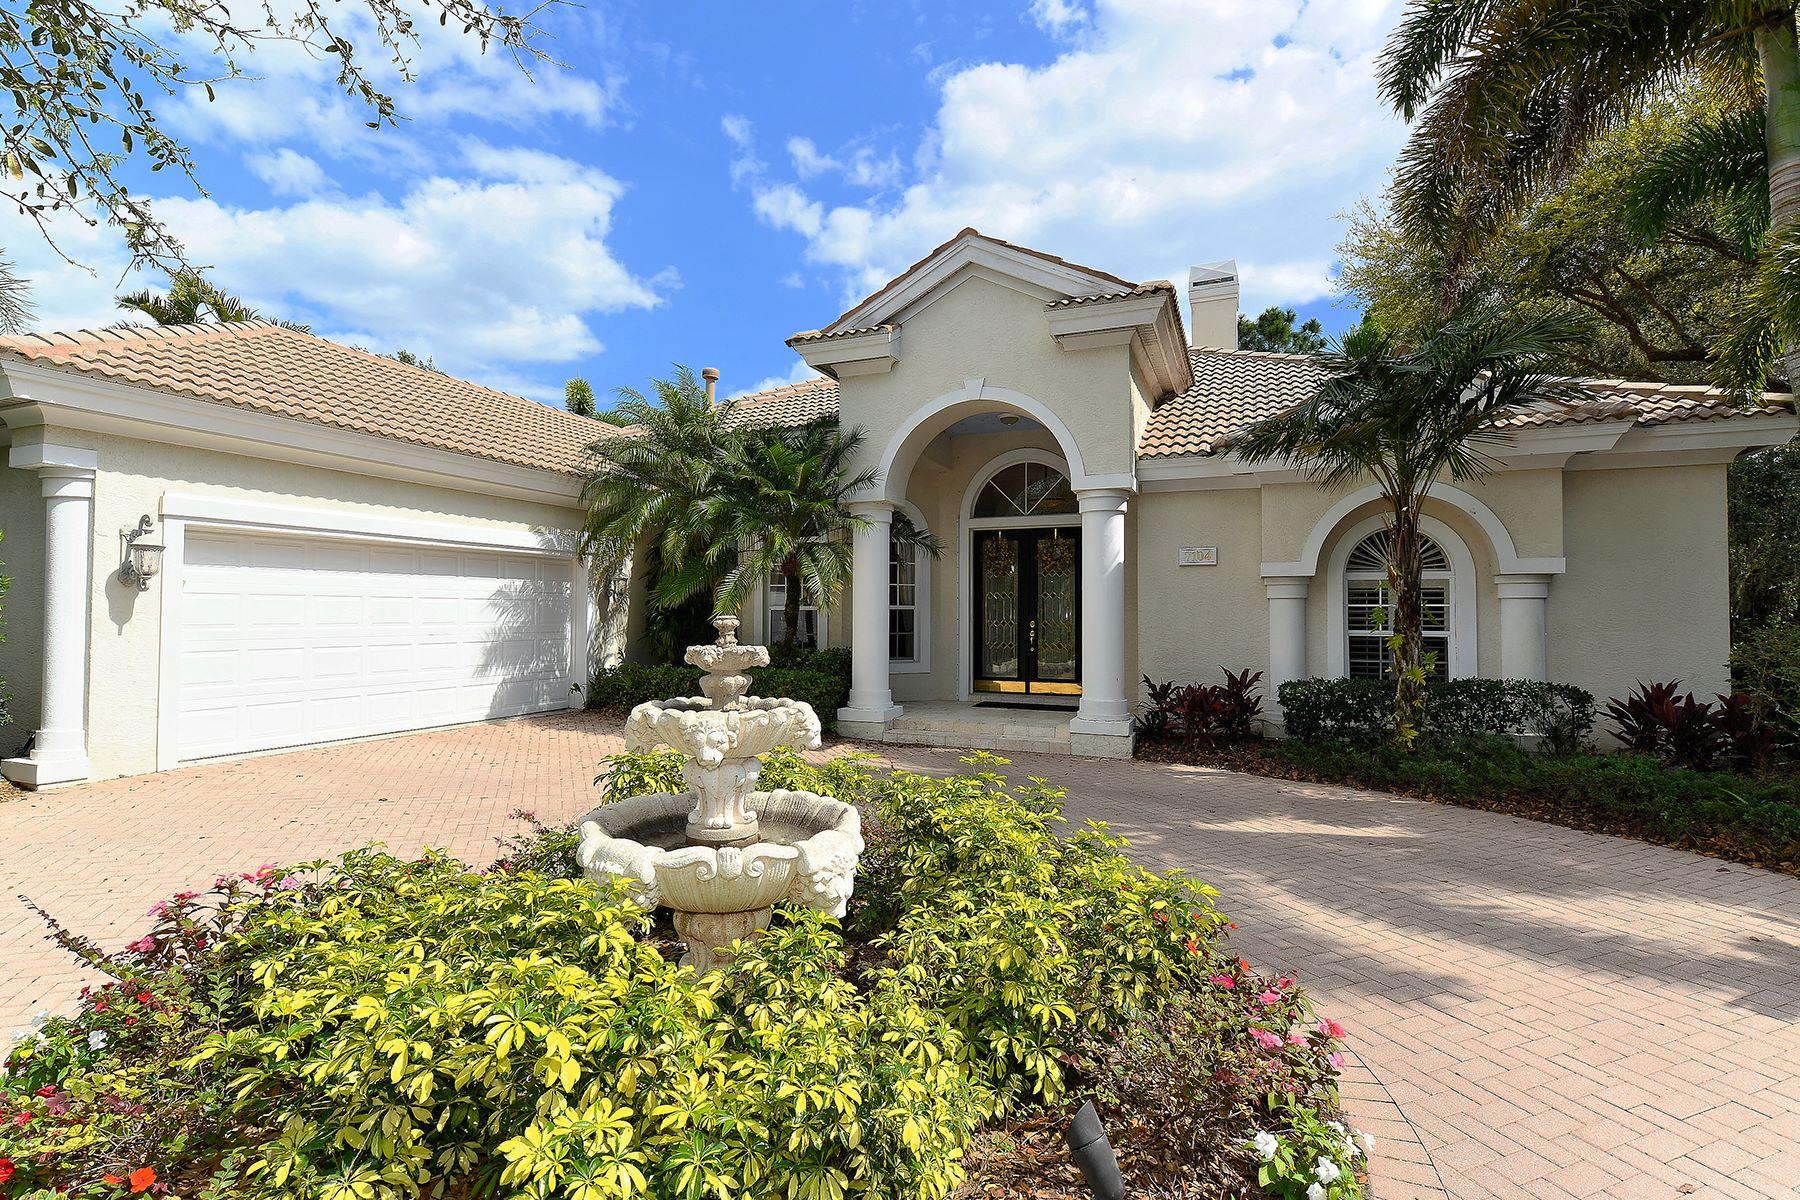 Villa per Vendita alle ore UNIVERSITY PARK 7104 Chatsworth Ct University Park, Florida, 34201 Stati Uniti